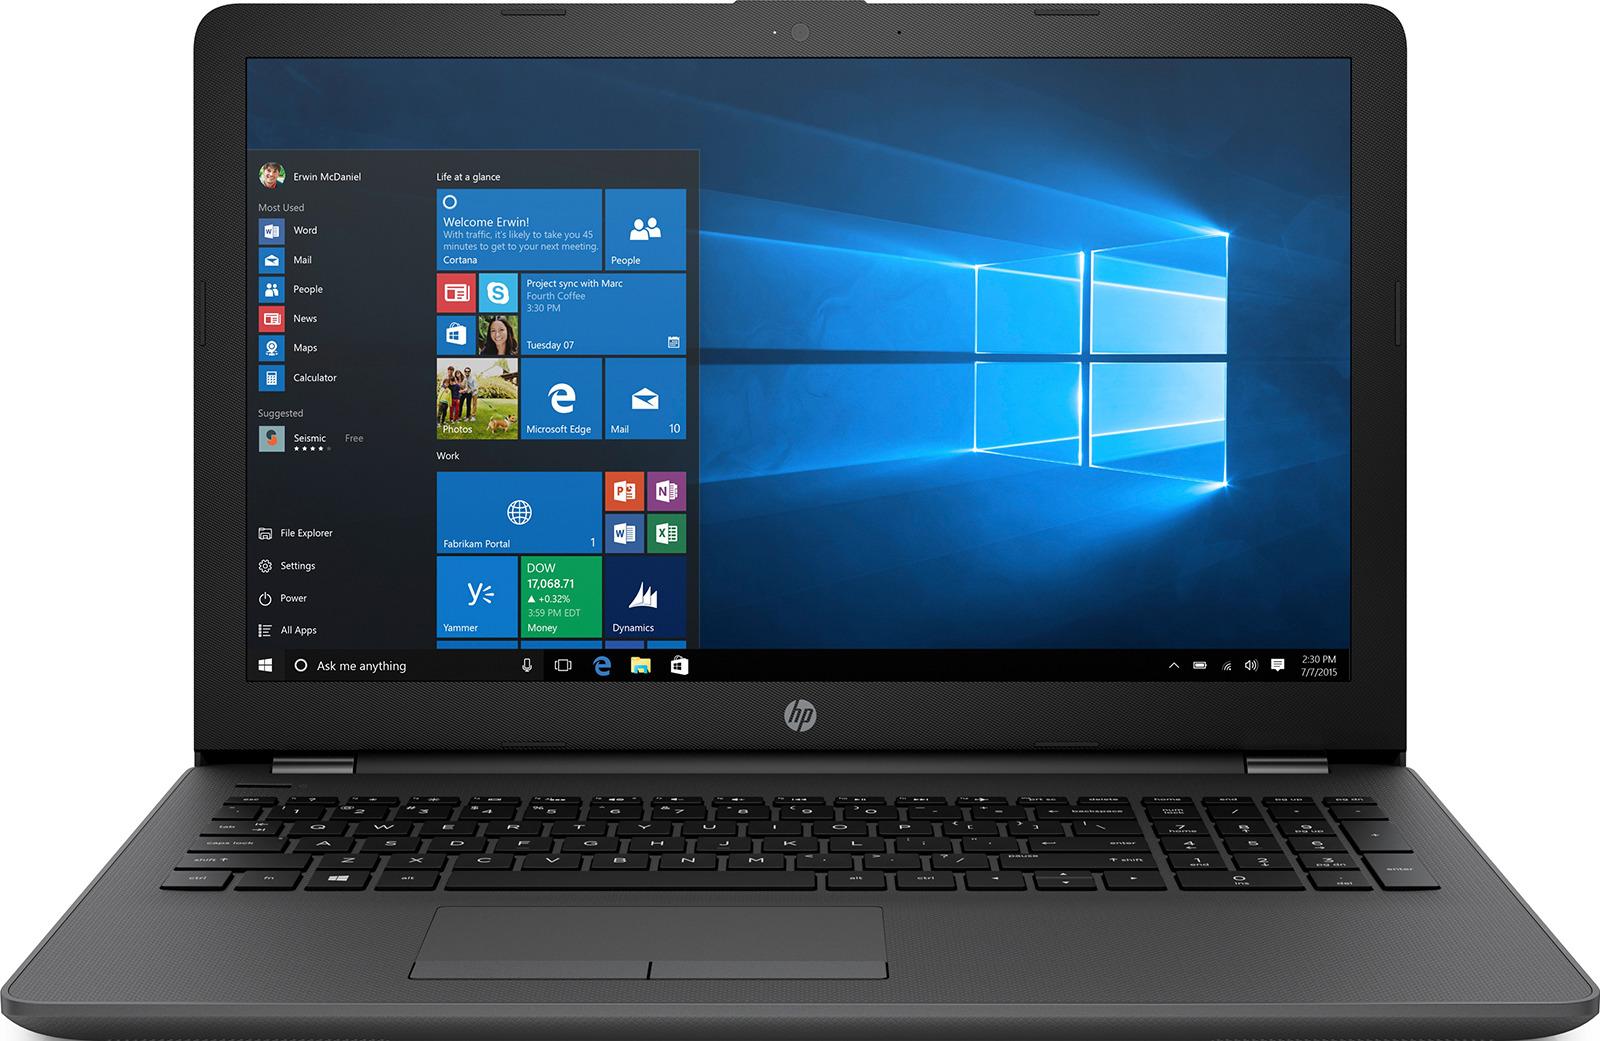 15.6 Ноутбук HP 250 G6 3QM25EA, темно-серый ноутбук уходит в спящий режим сам windows 10